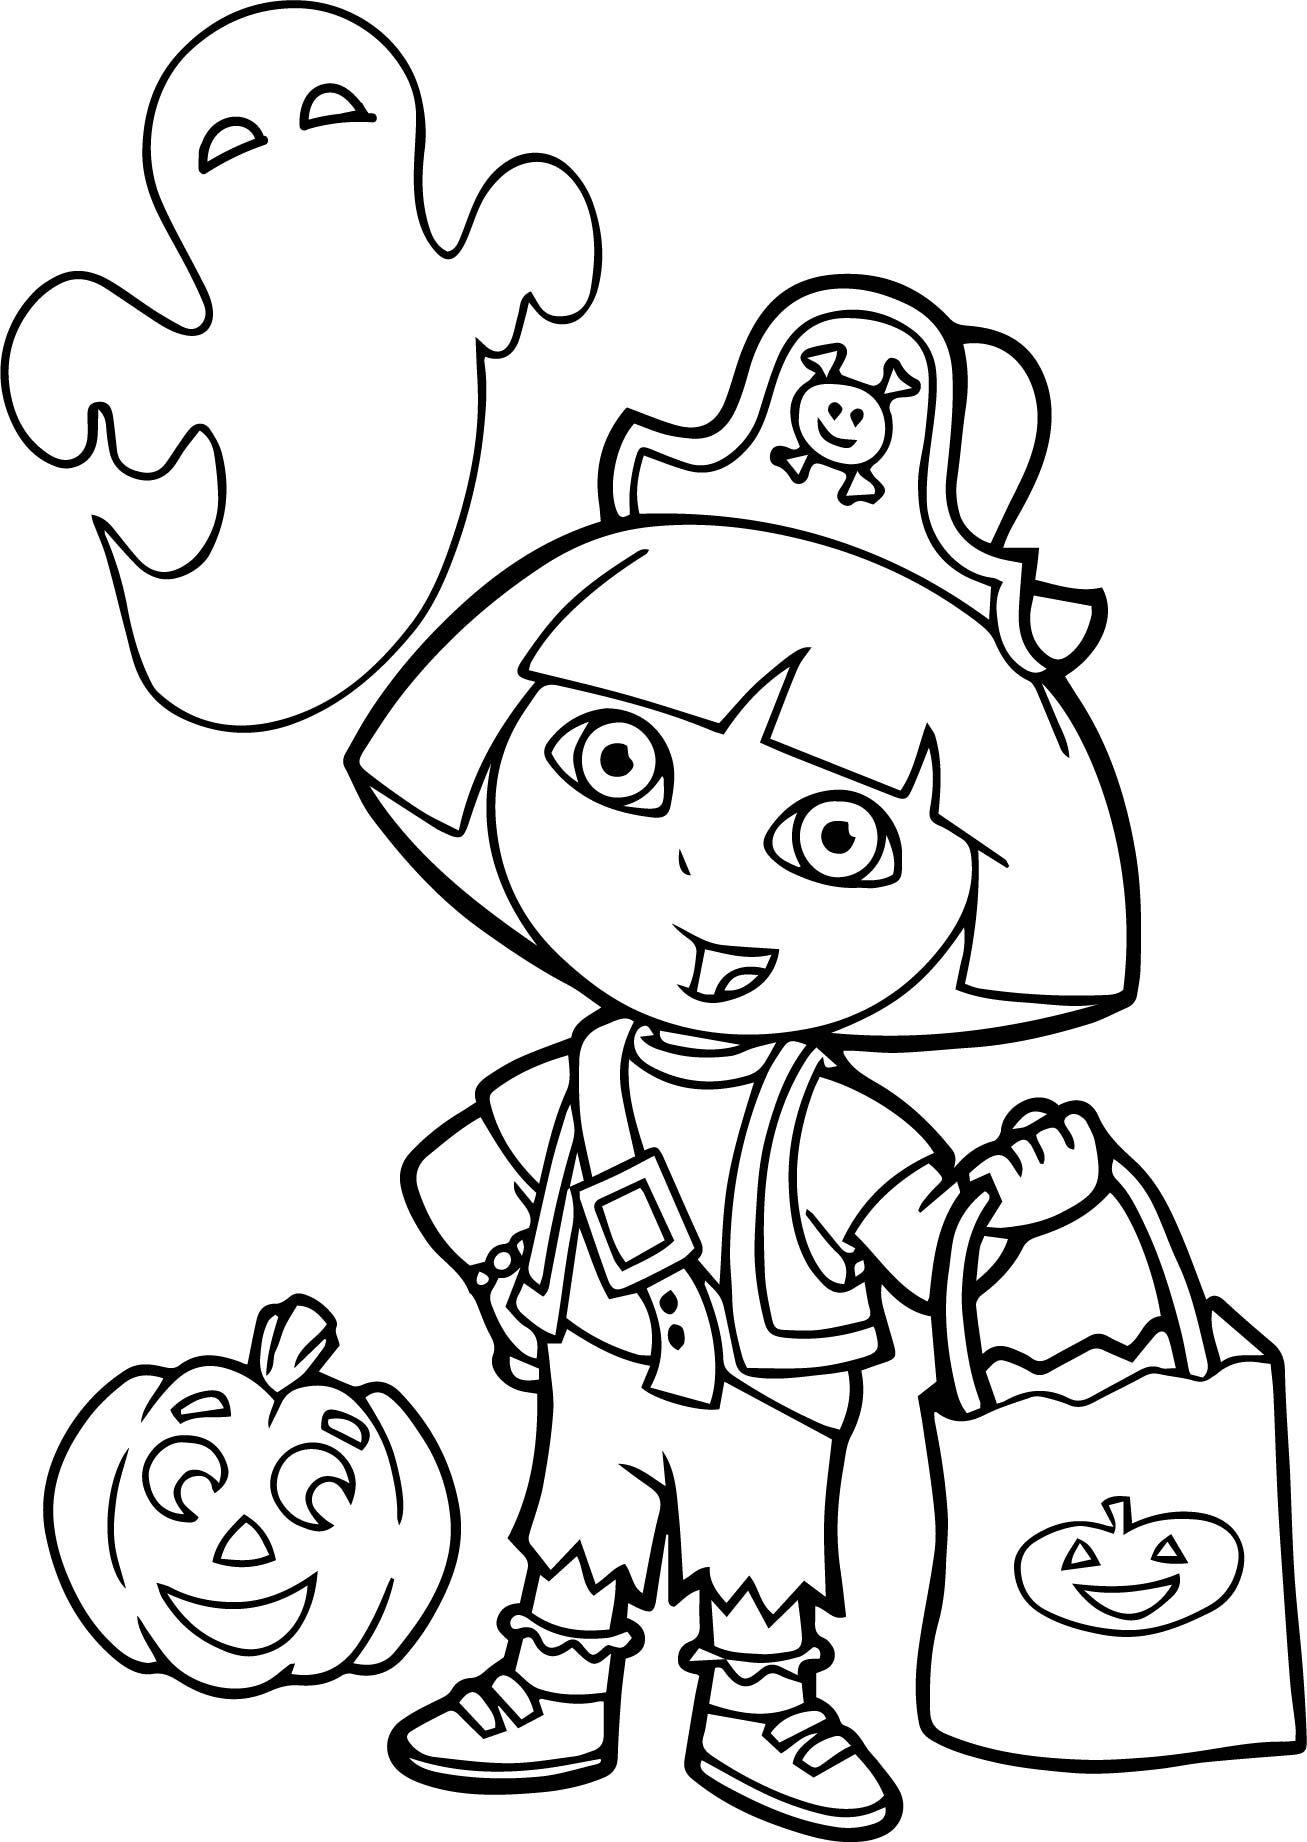 Cool Dora Halloween Coloring Page Halloween Coloring Pages Cartoon Coloring Pages Halloween Coloring